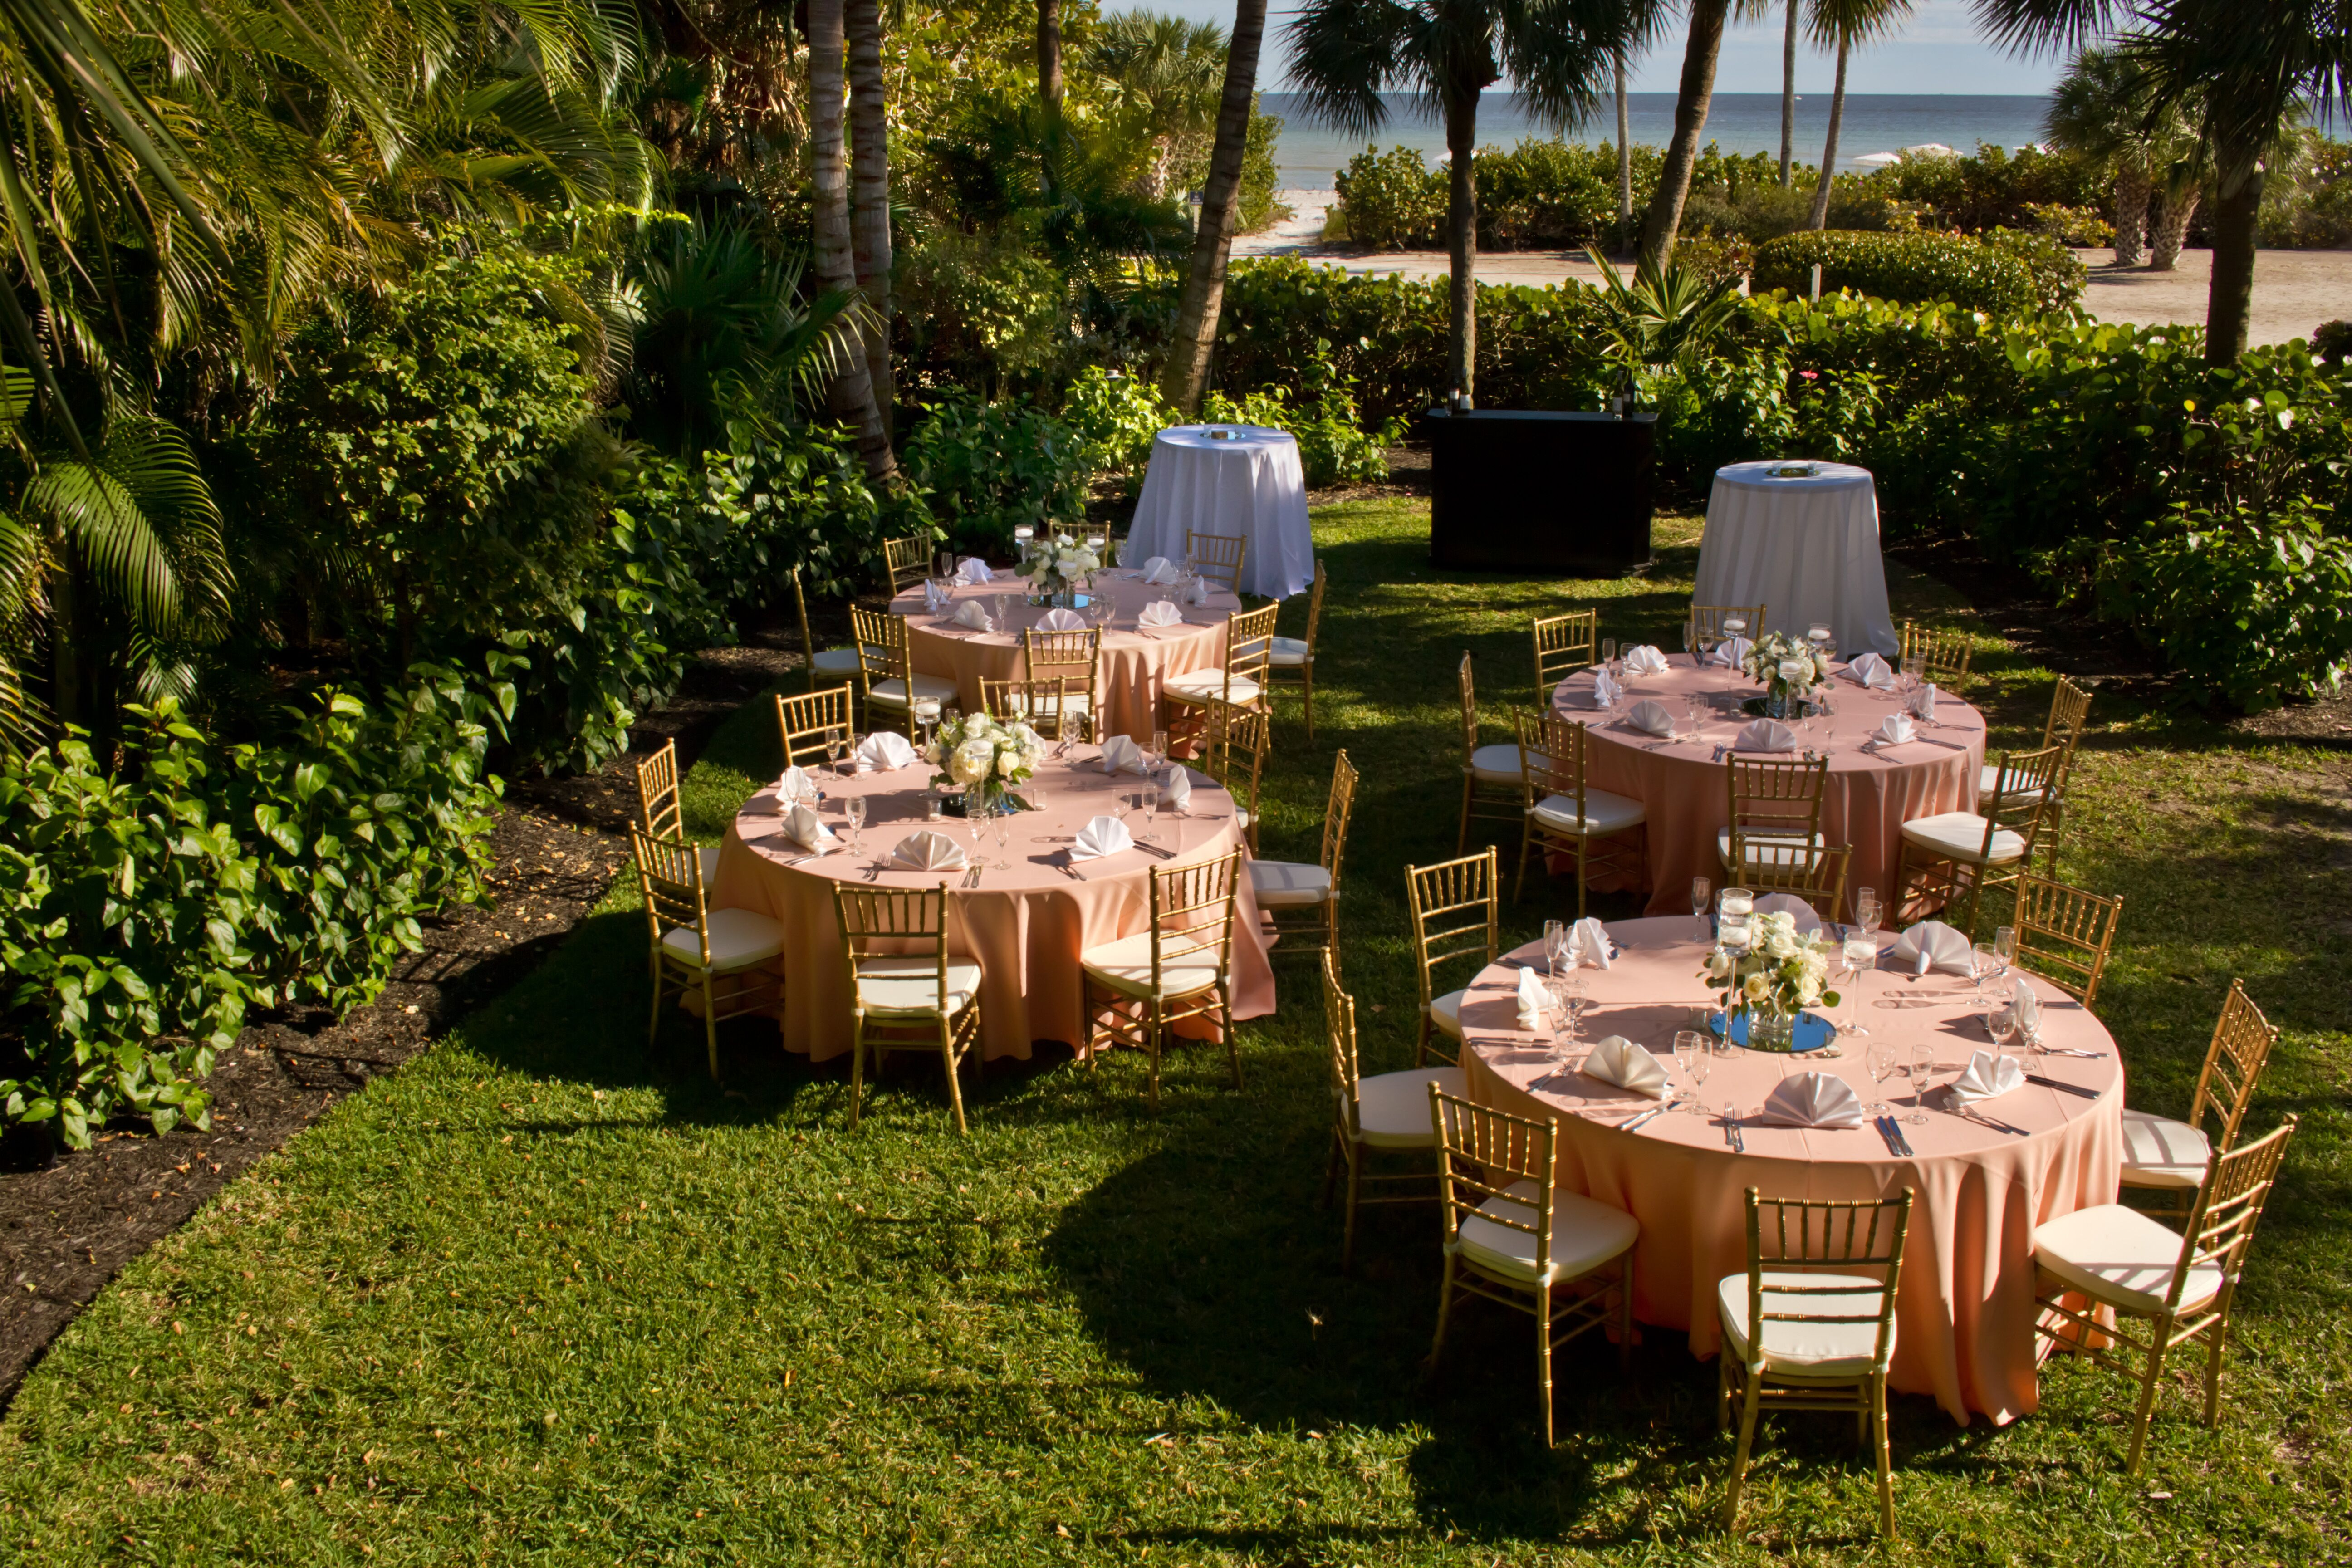 sundial beach resort u0026 spa sanibel fl